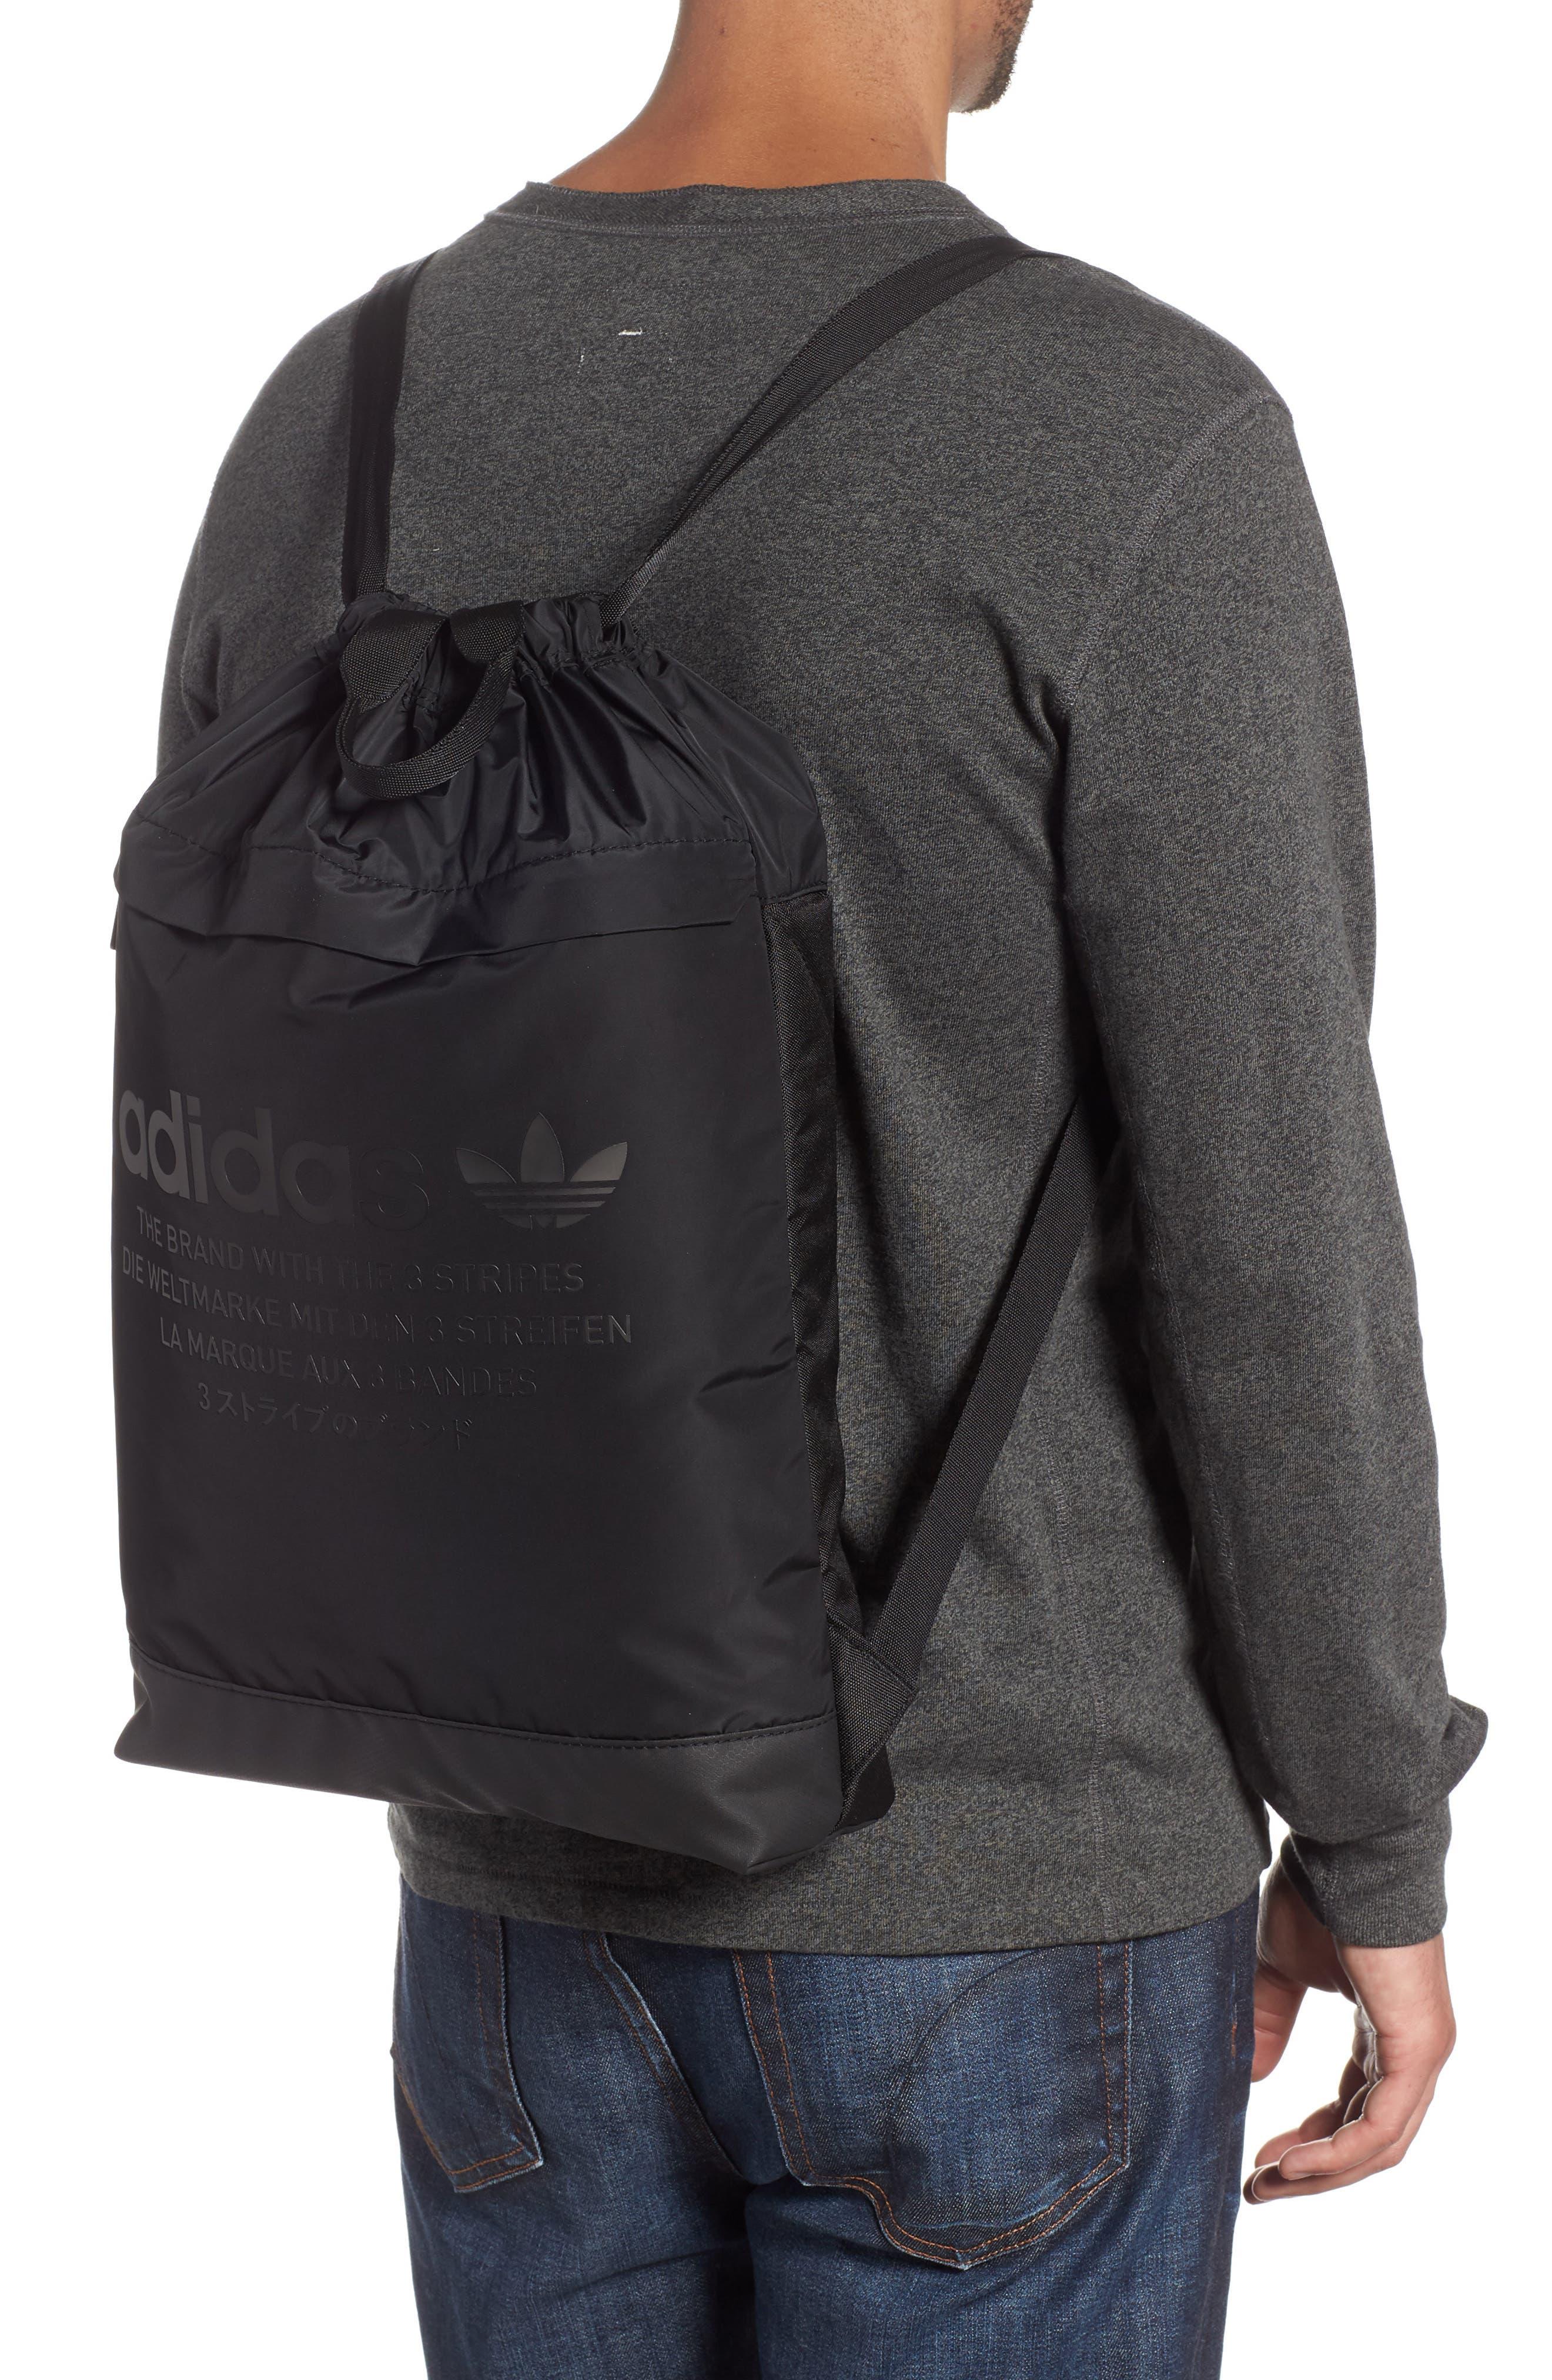 NMD Sack Pack,                             Alternate thumbnail 2, color,                             BLACK